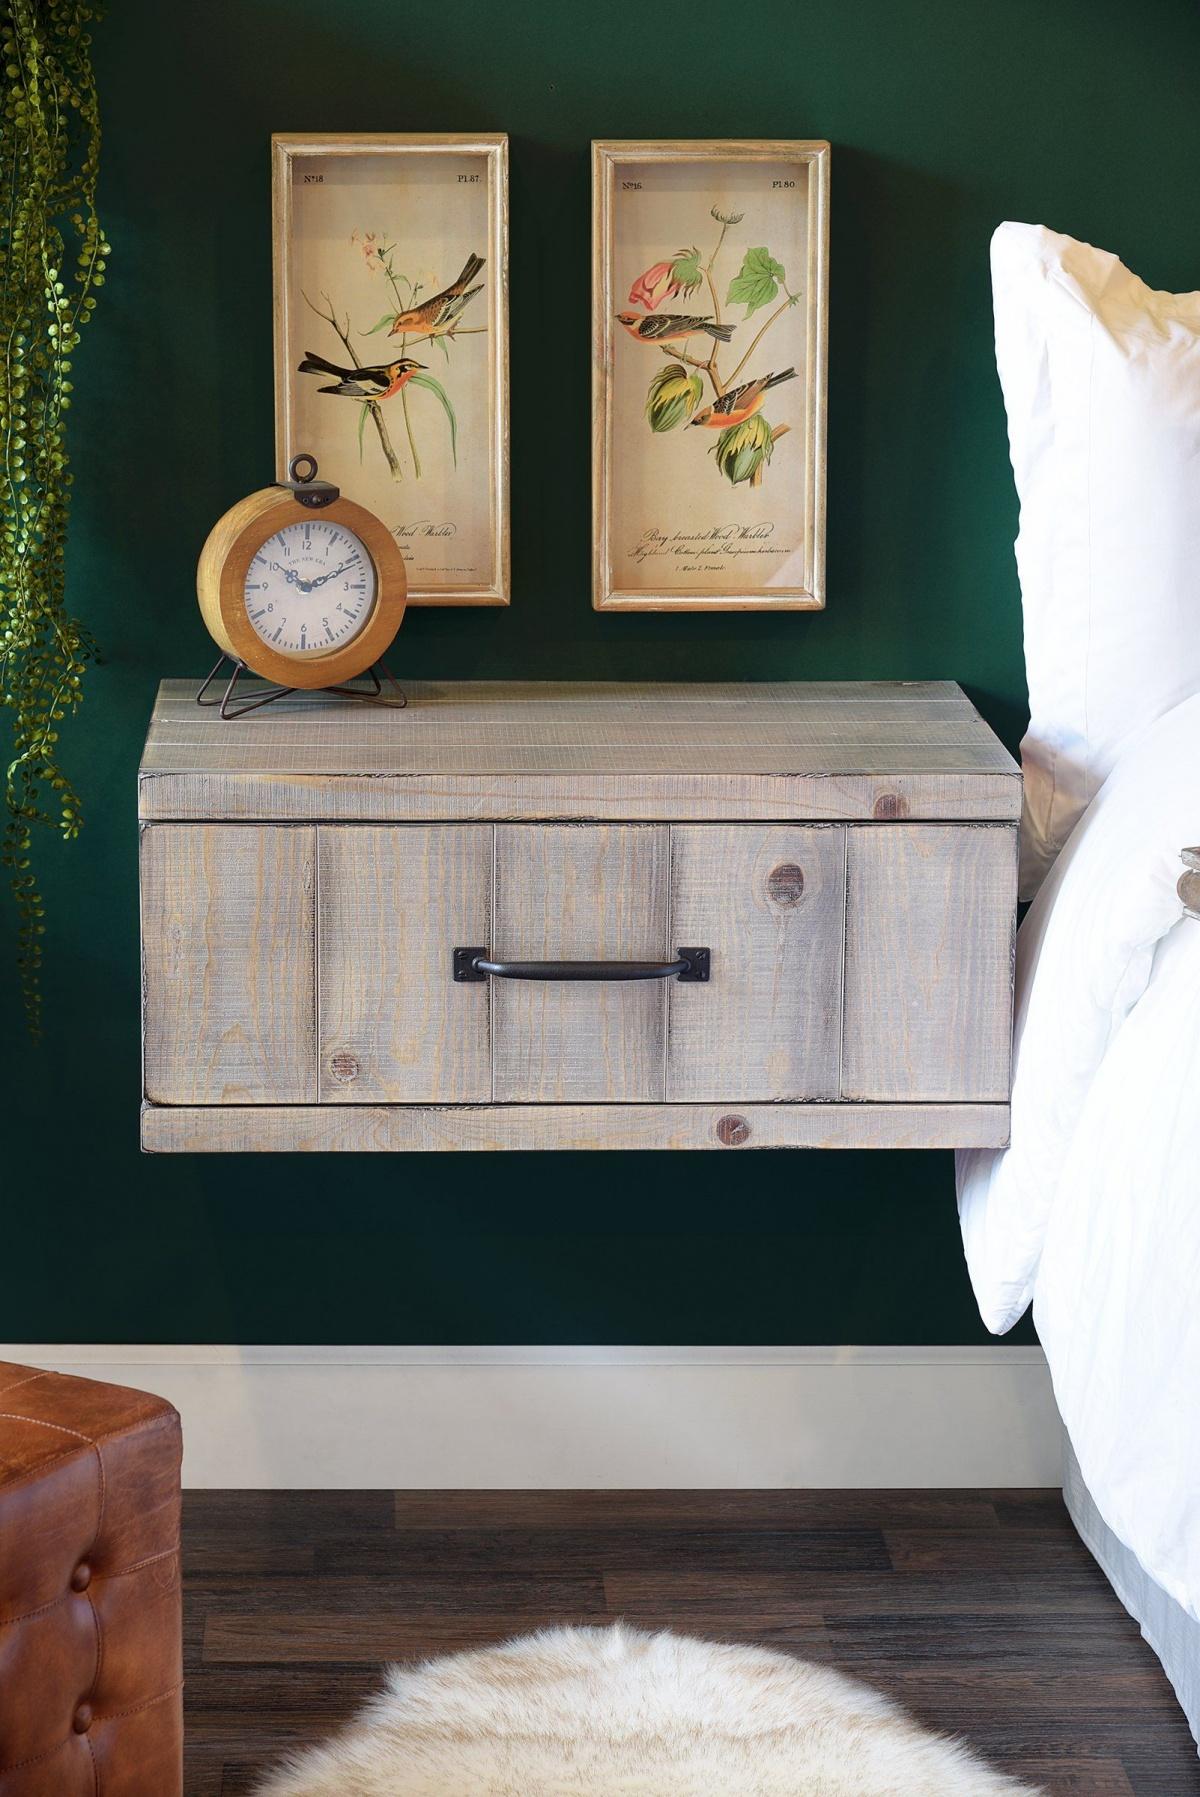 Wall-mount your nightstand